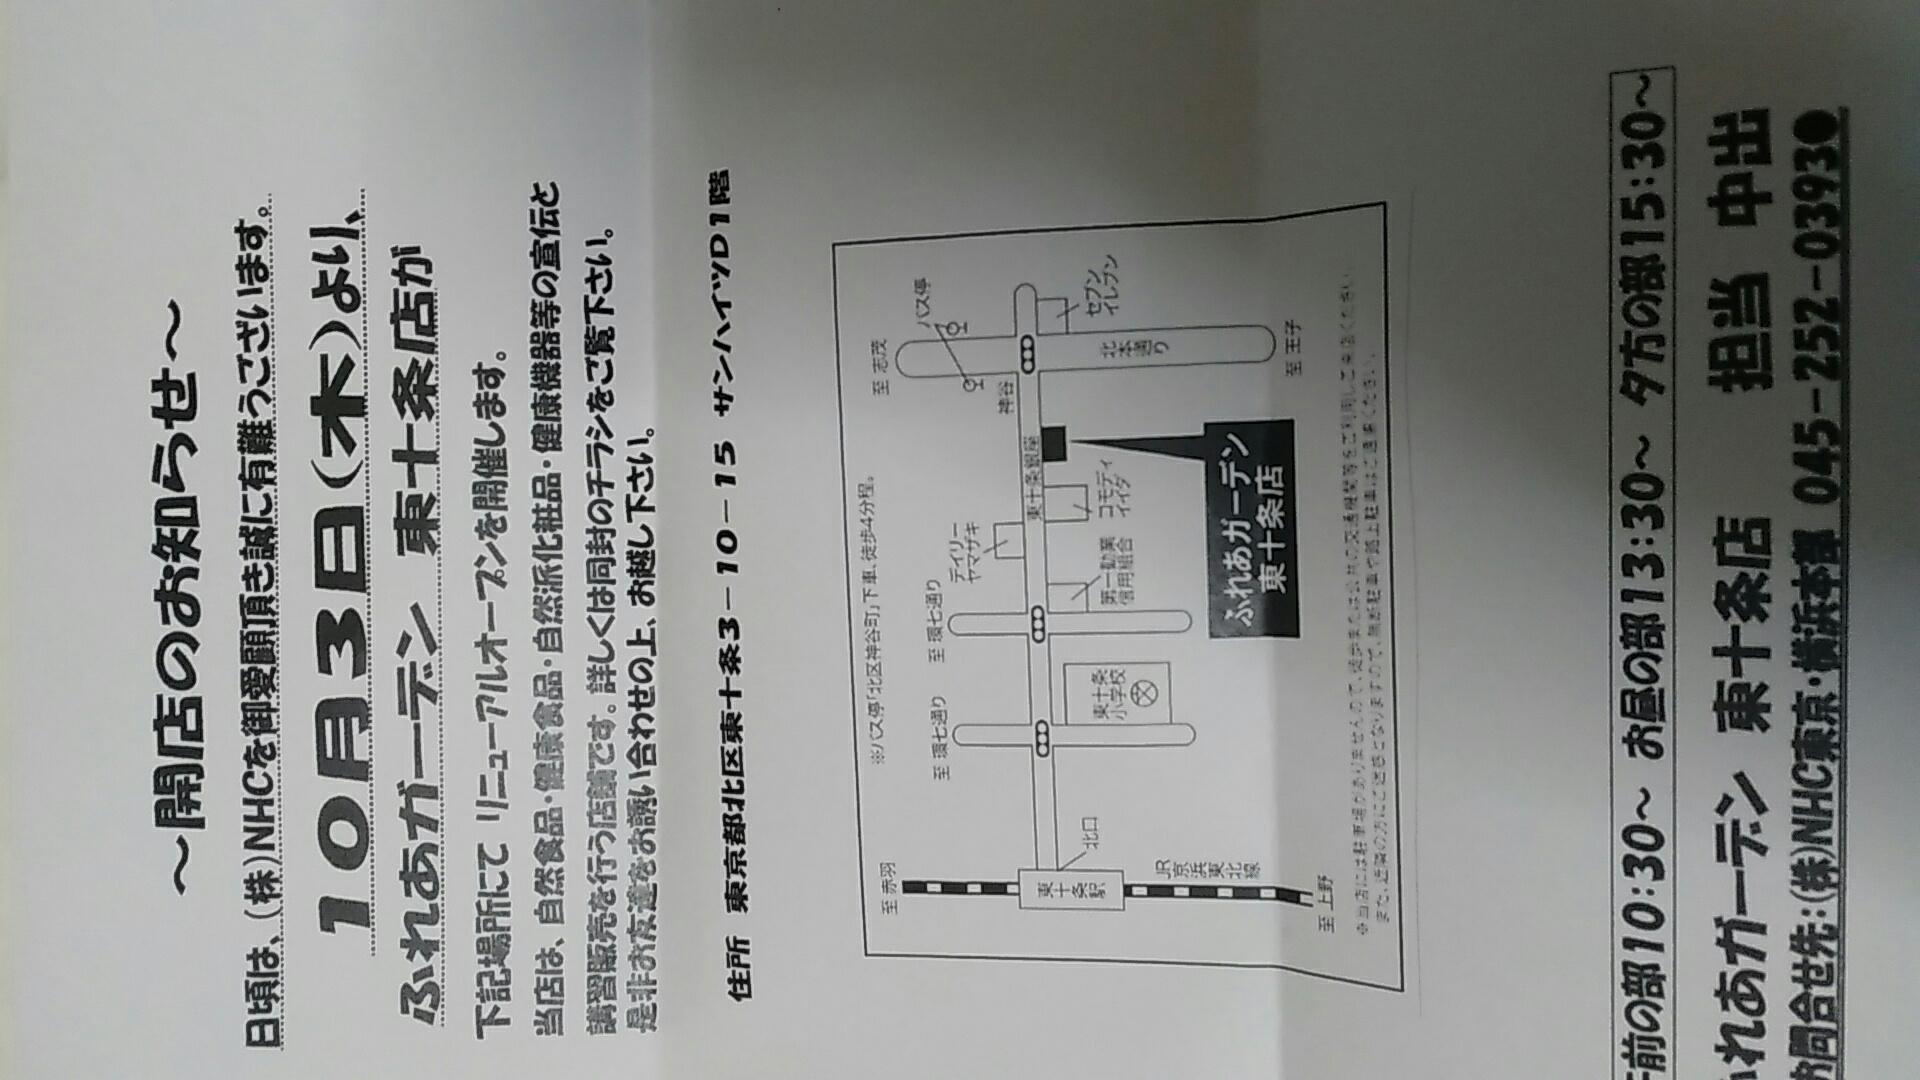 Nhc 株式 ガーデン あ 会社 ふれ NHCの評判/社風/社員の口コミ(全94件)【転職会議】